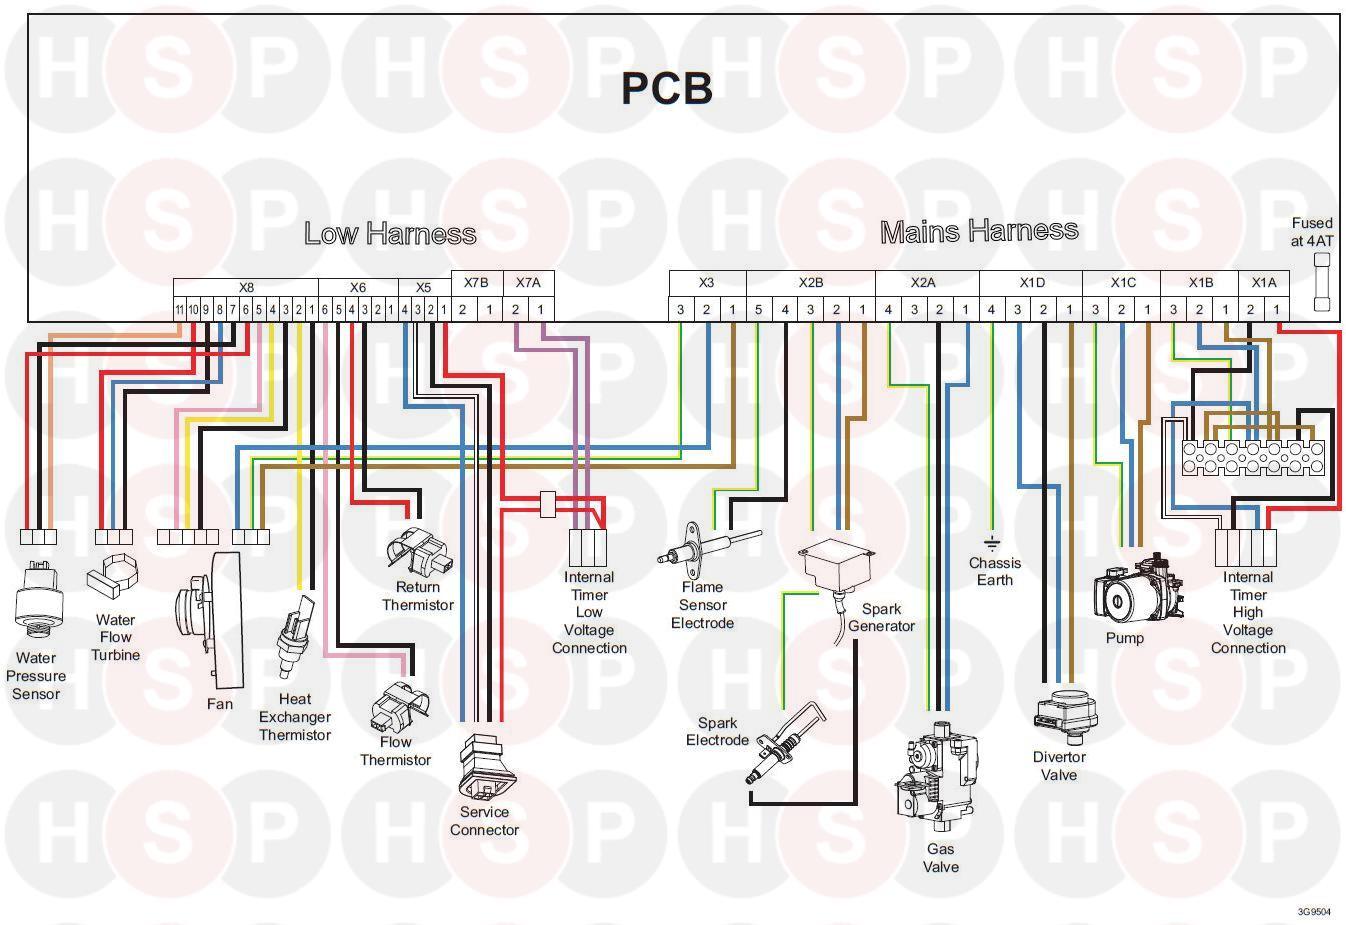 Boiler Wiring Diagram from www.heatingspareparts.com